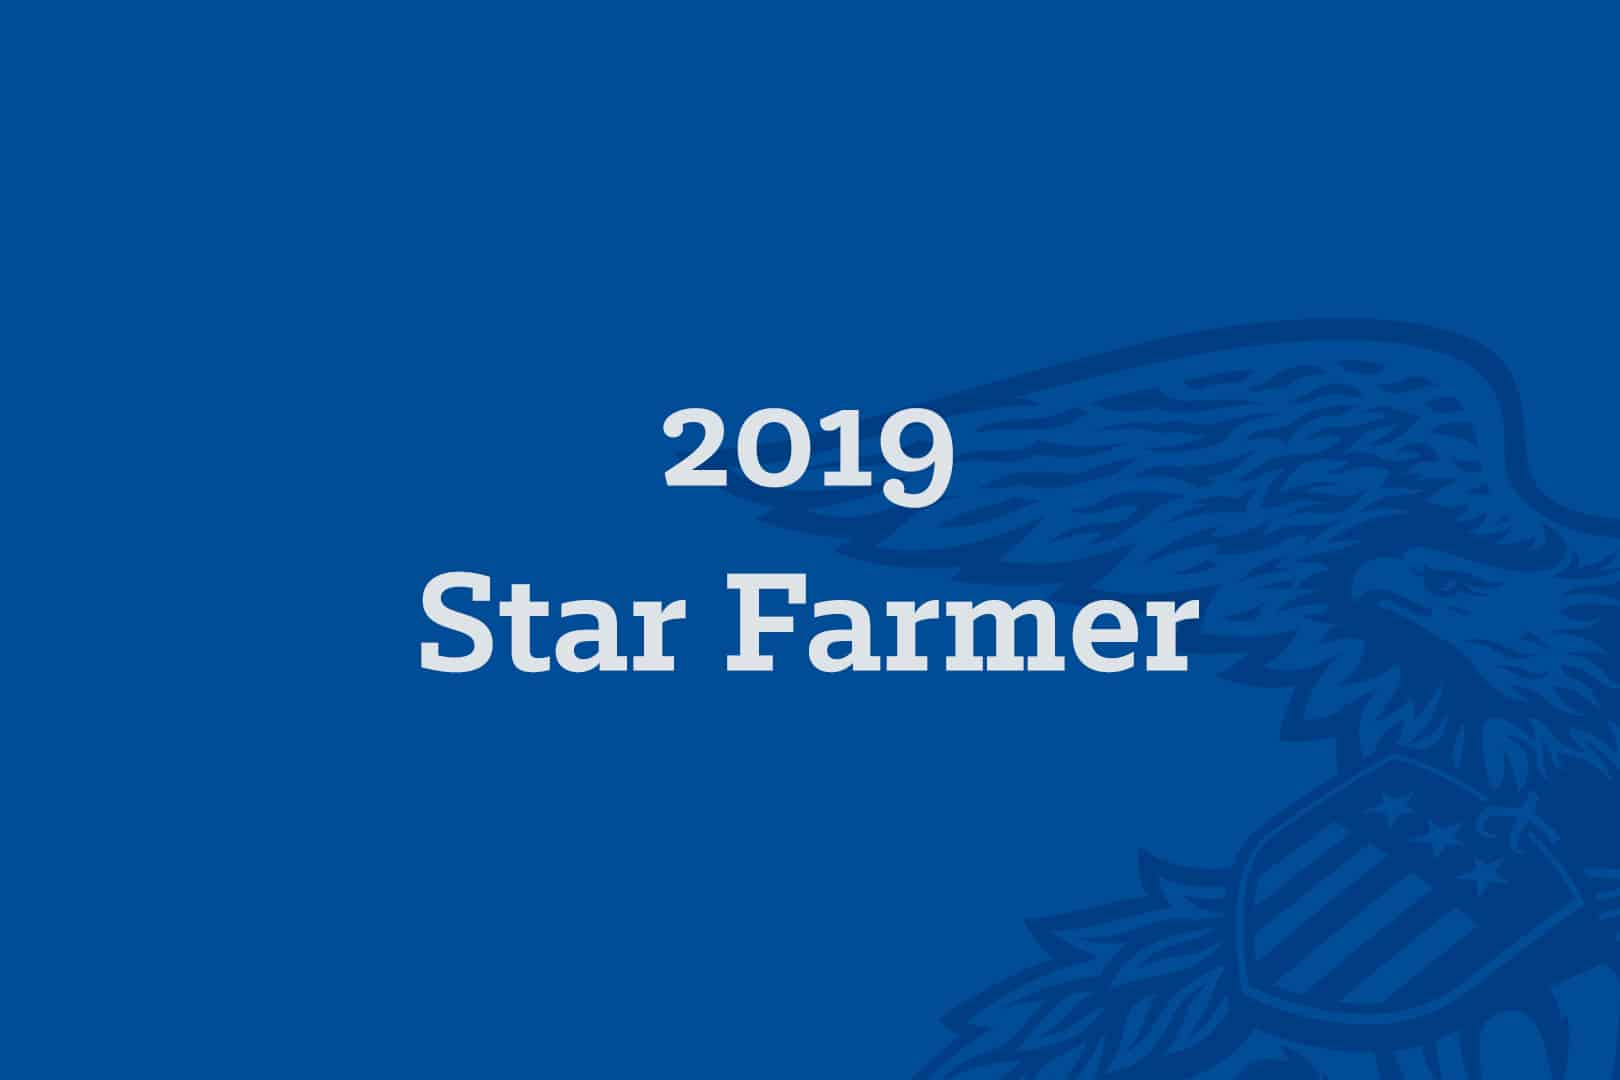 2019 Star Farmer 600x400